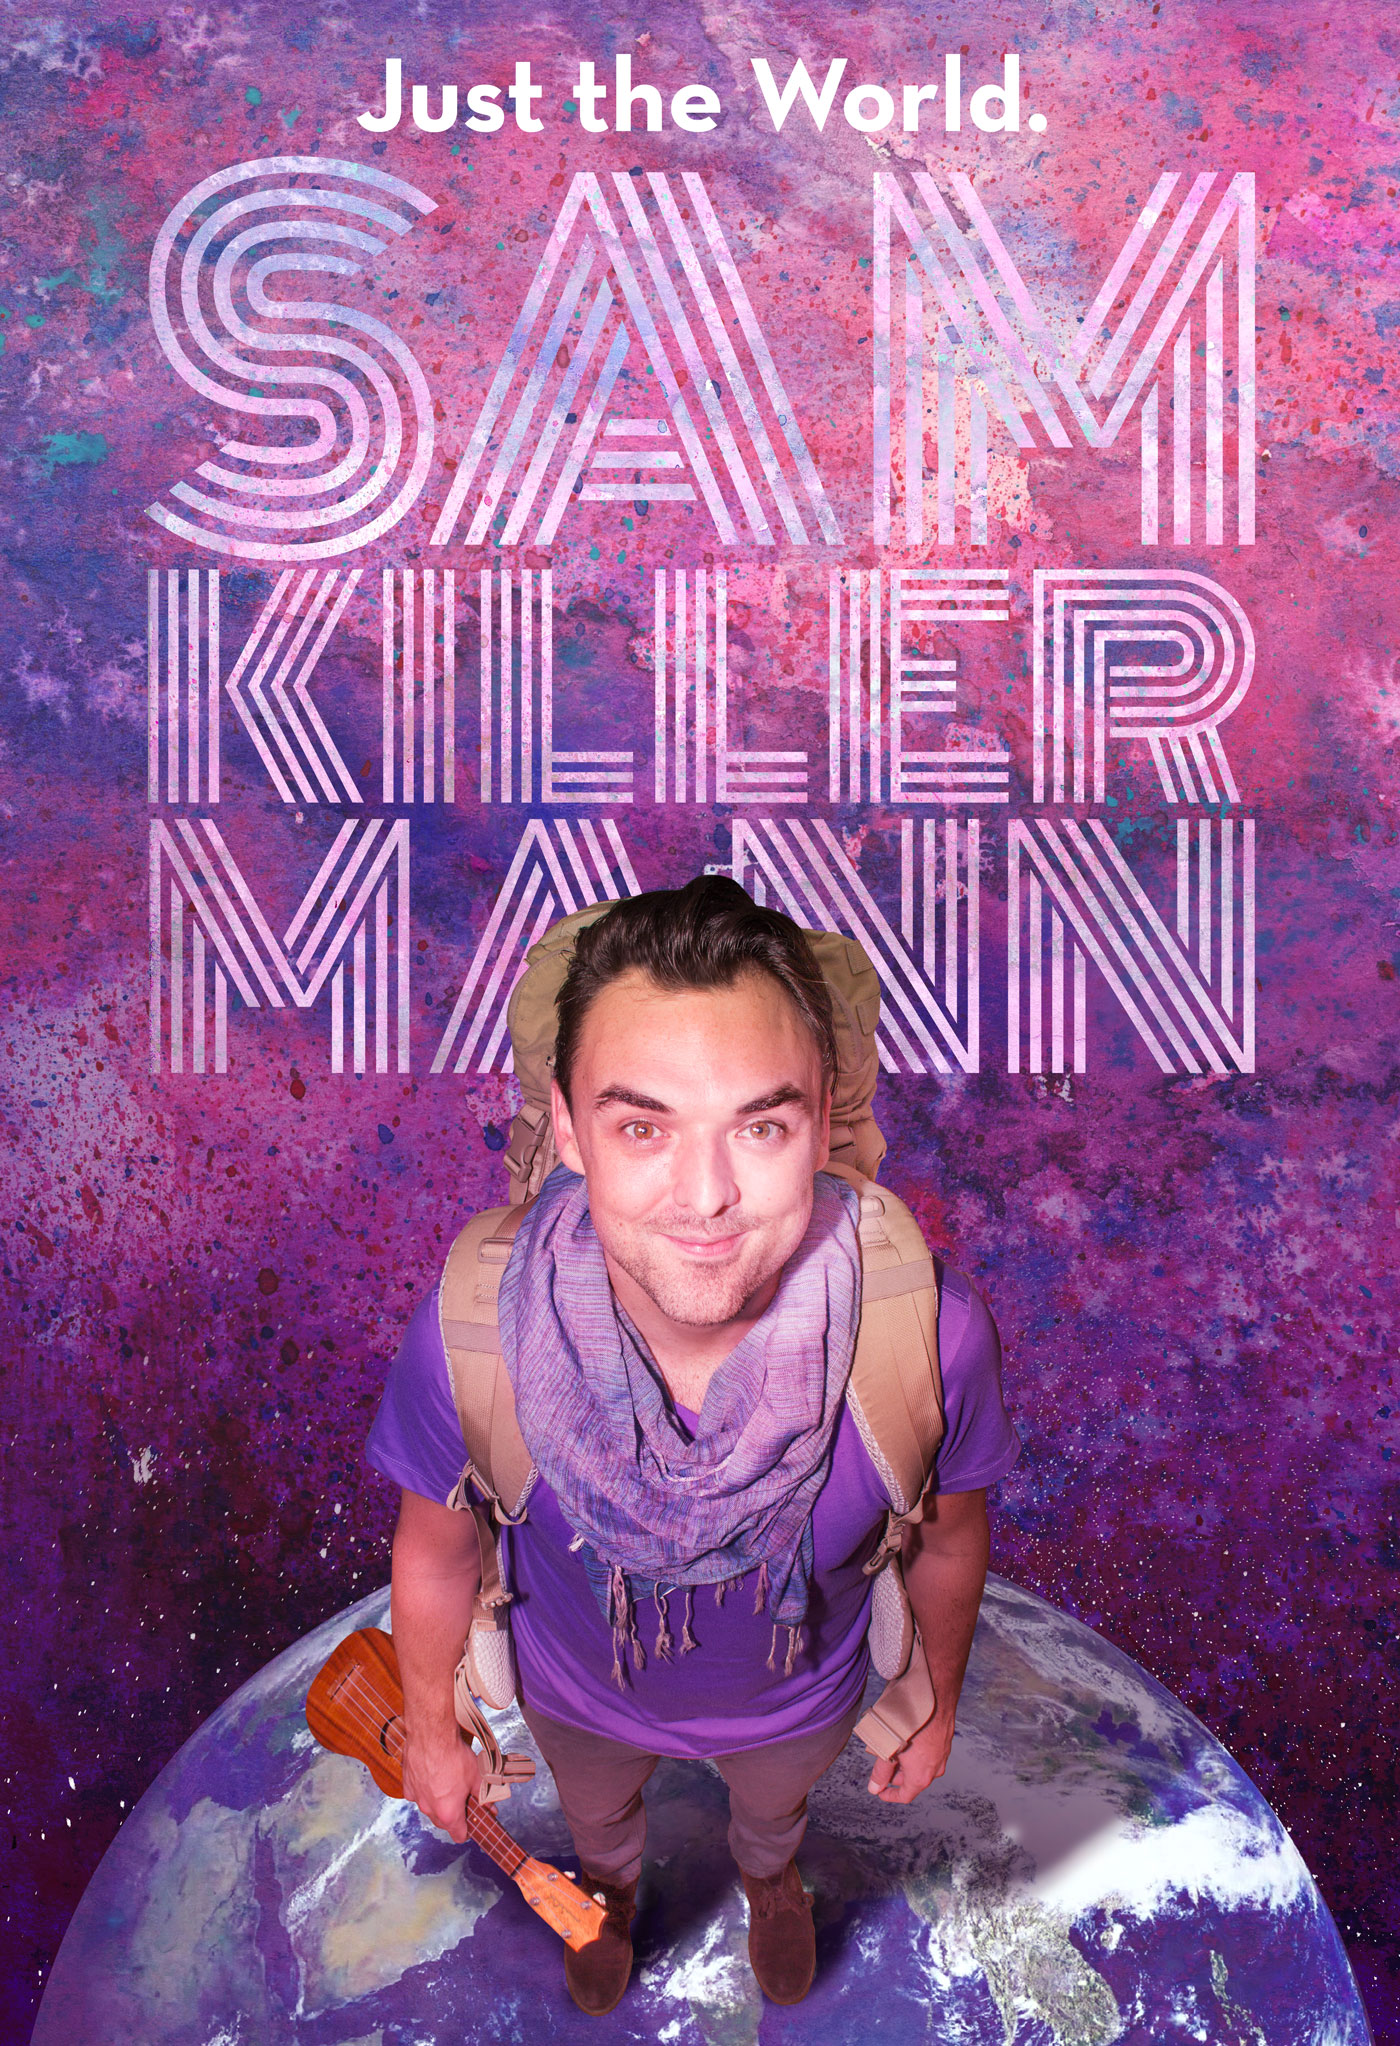 Sam Killermann standing on a globe holding a ukulele